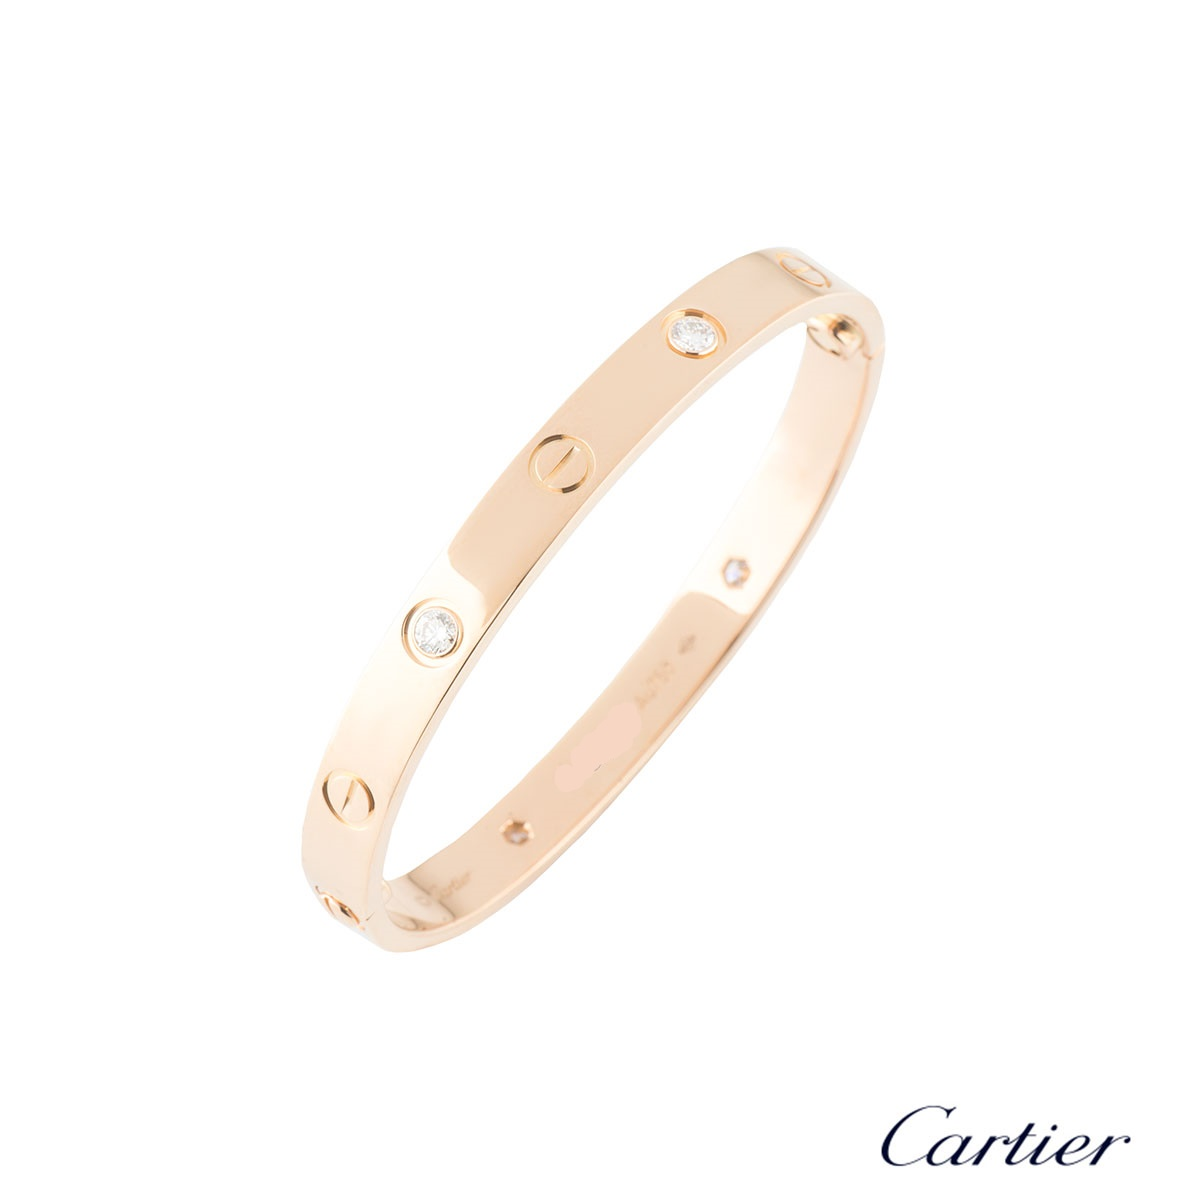 Cartier Rose Gold Half Diamond Love Bracelet Size 19B6036019